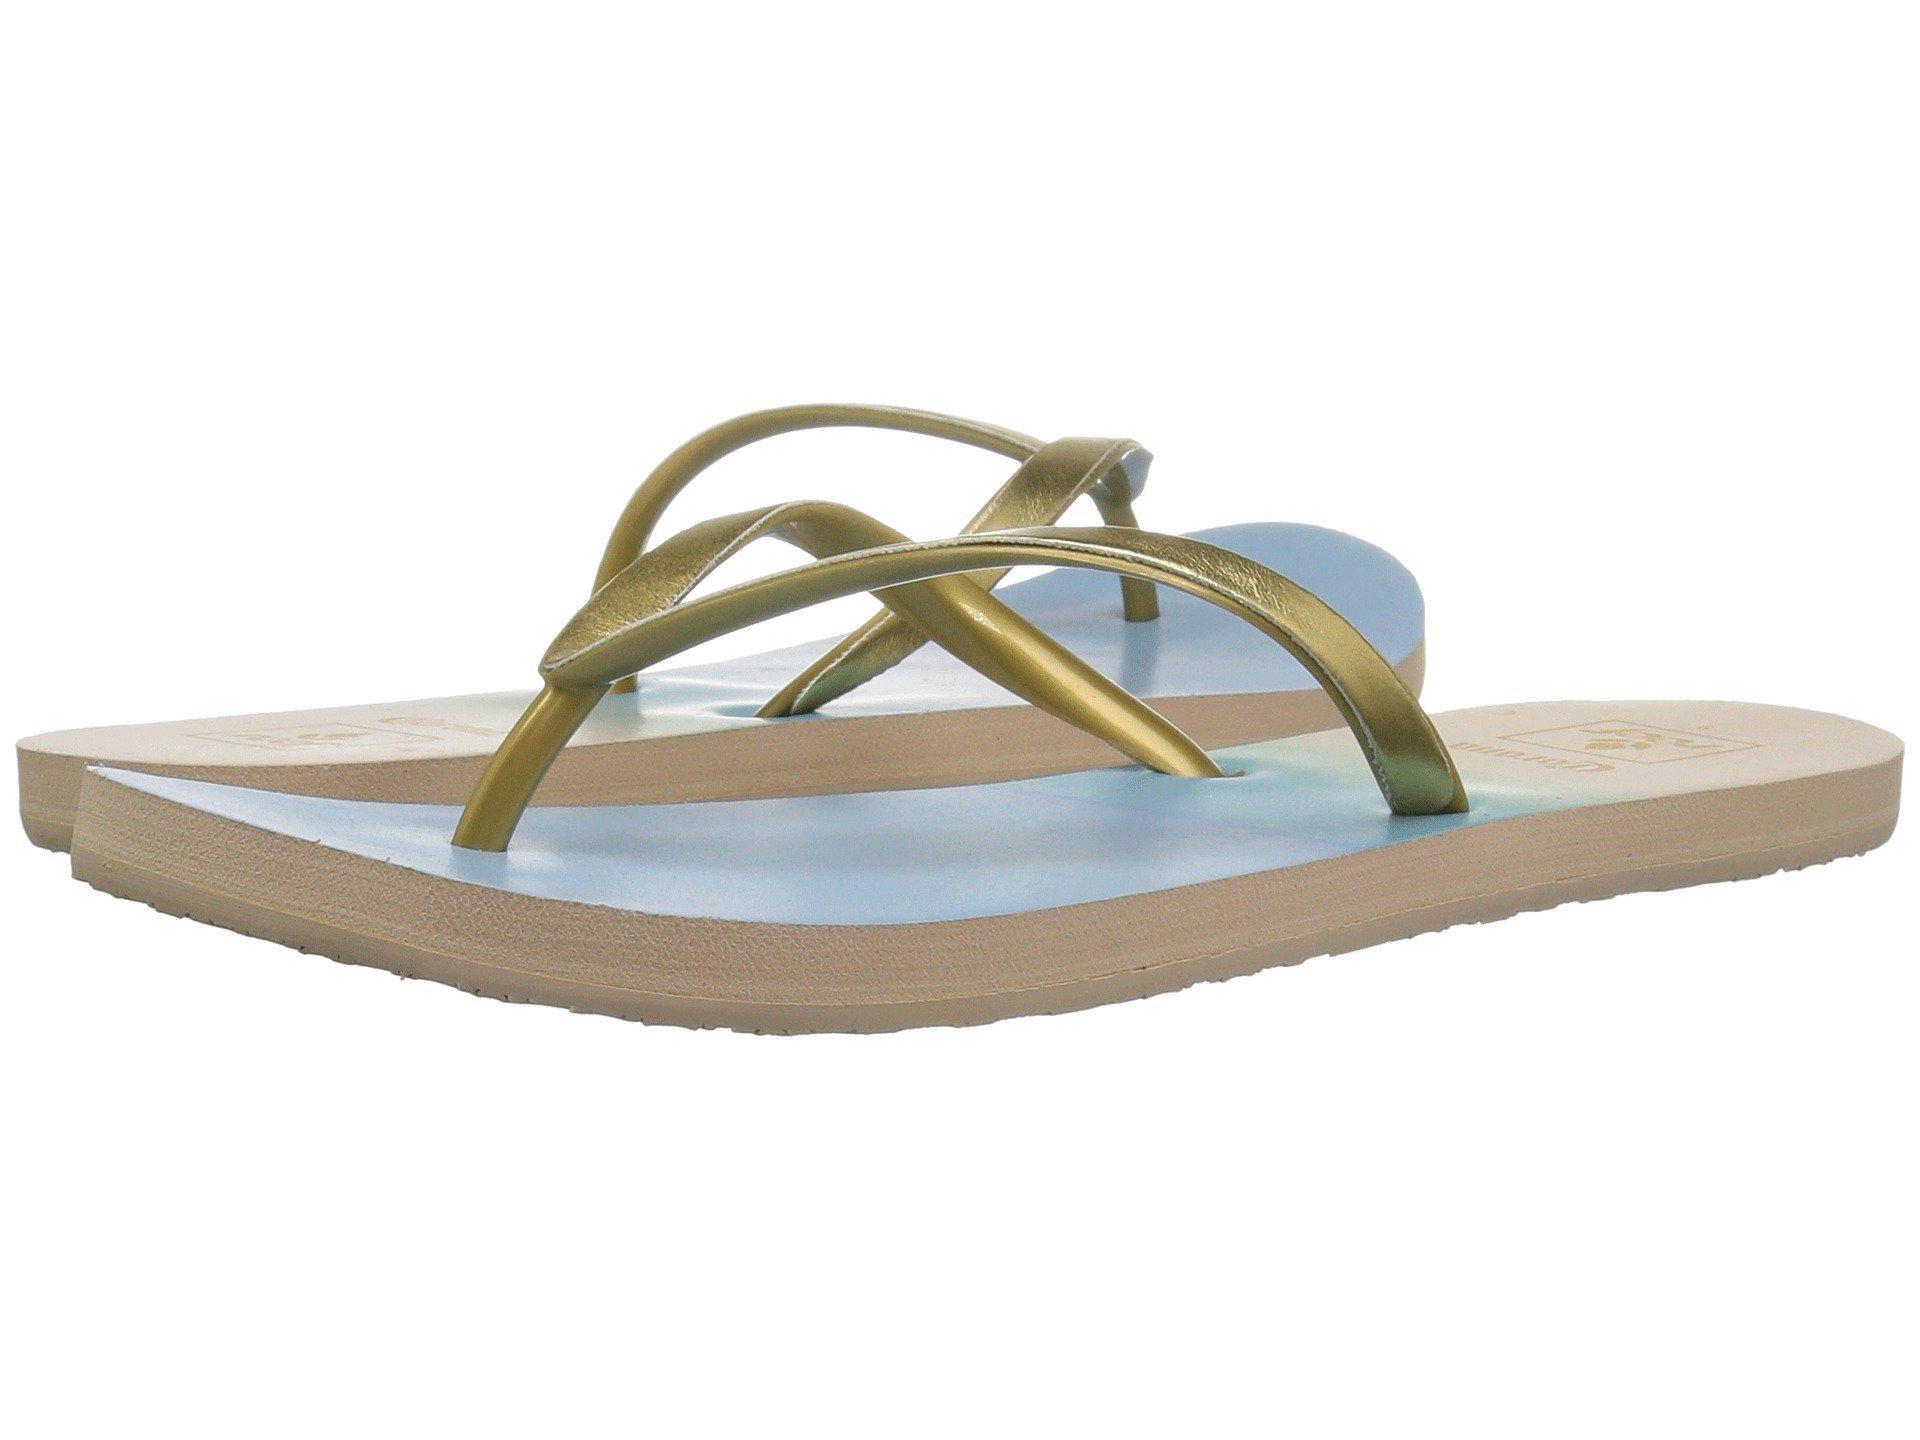 a483f918d519 Lyst - Reef Stargazer X Corona (beach) Women s Sandals in Blue